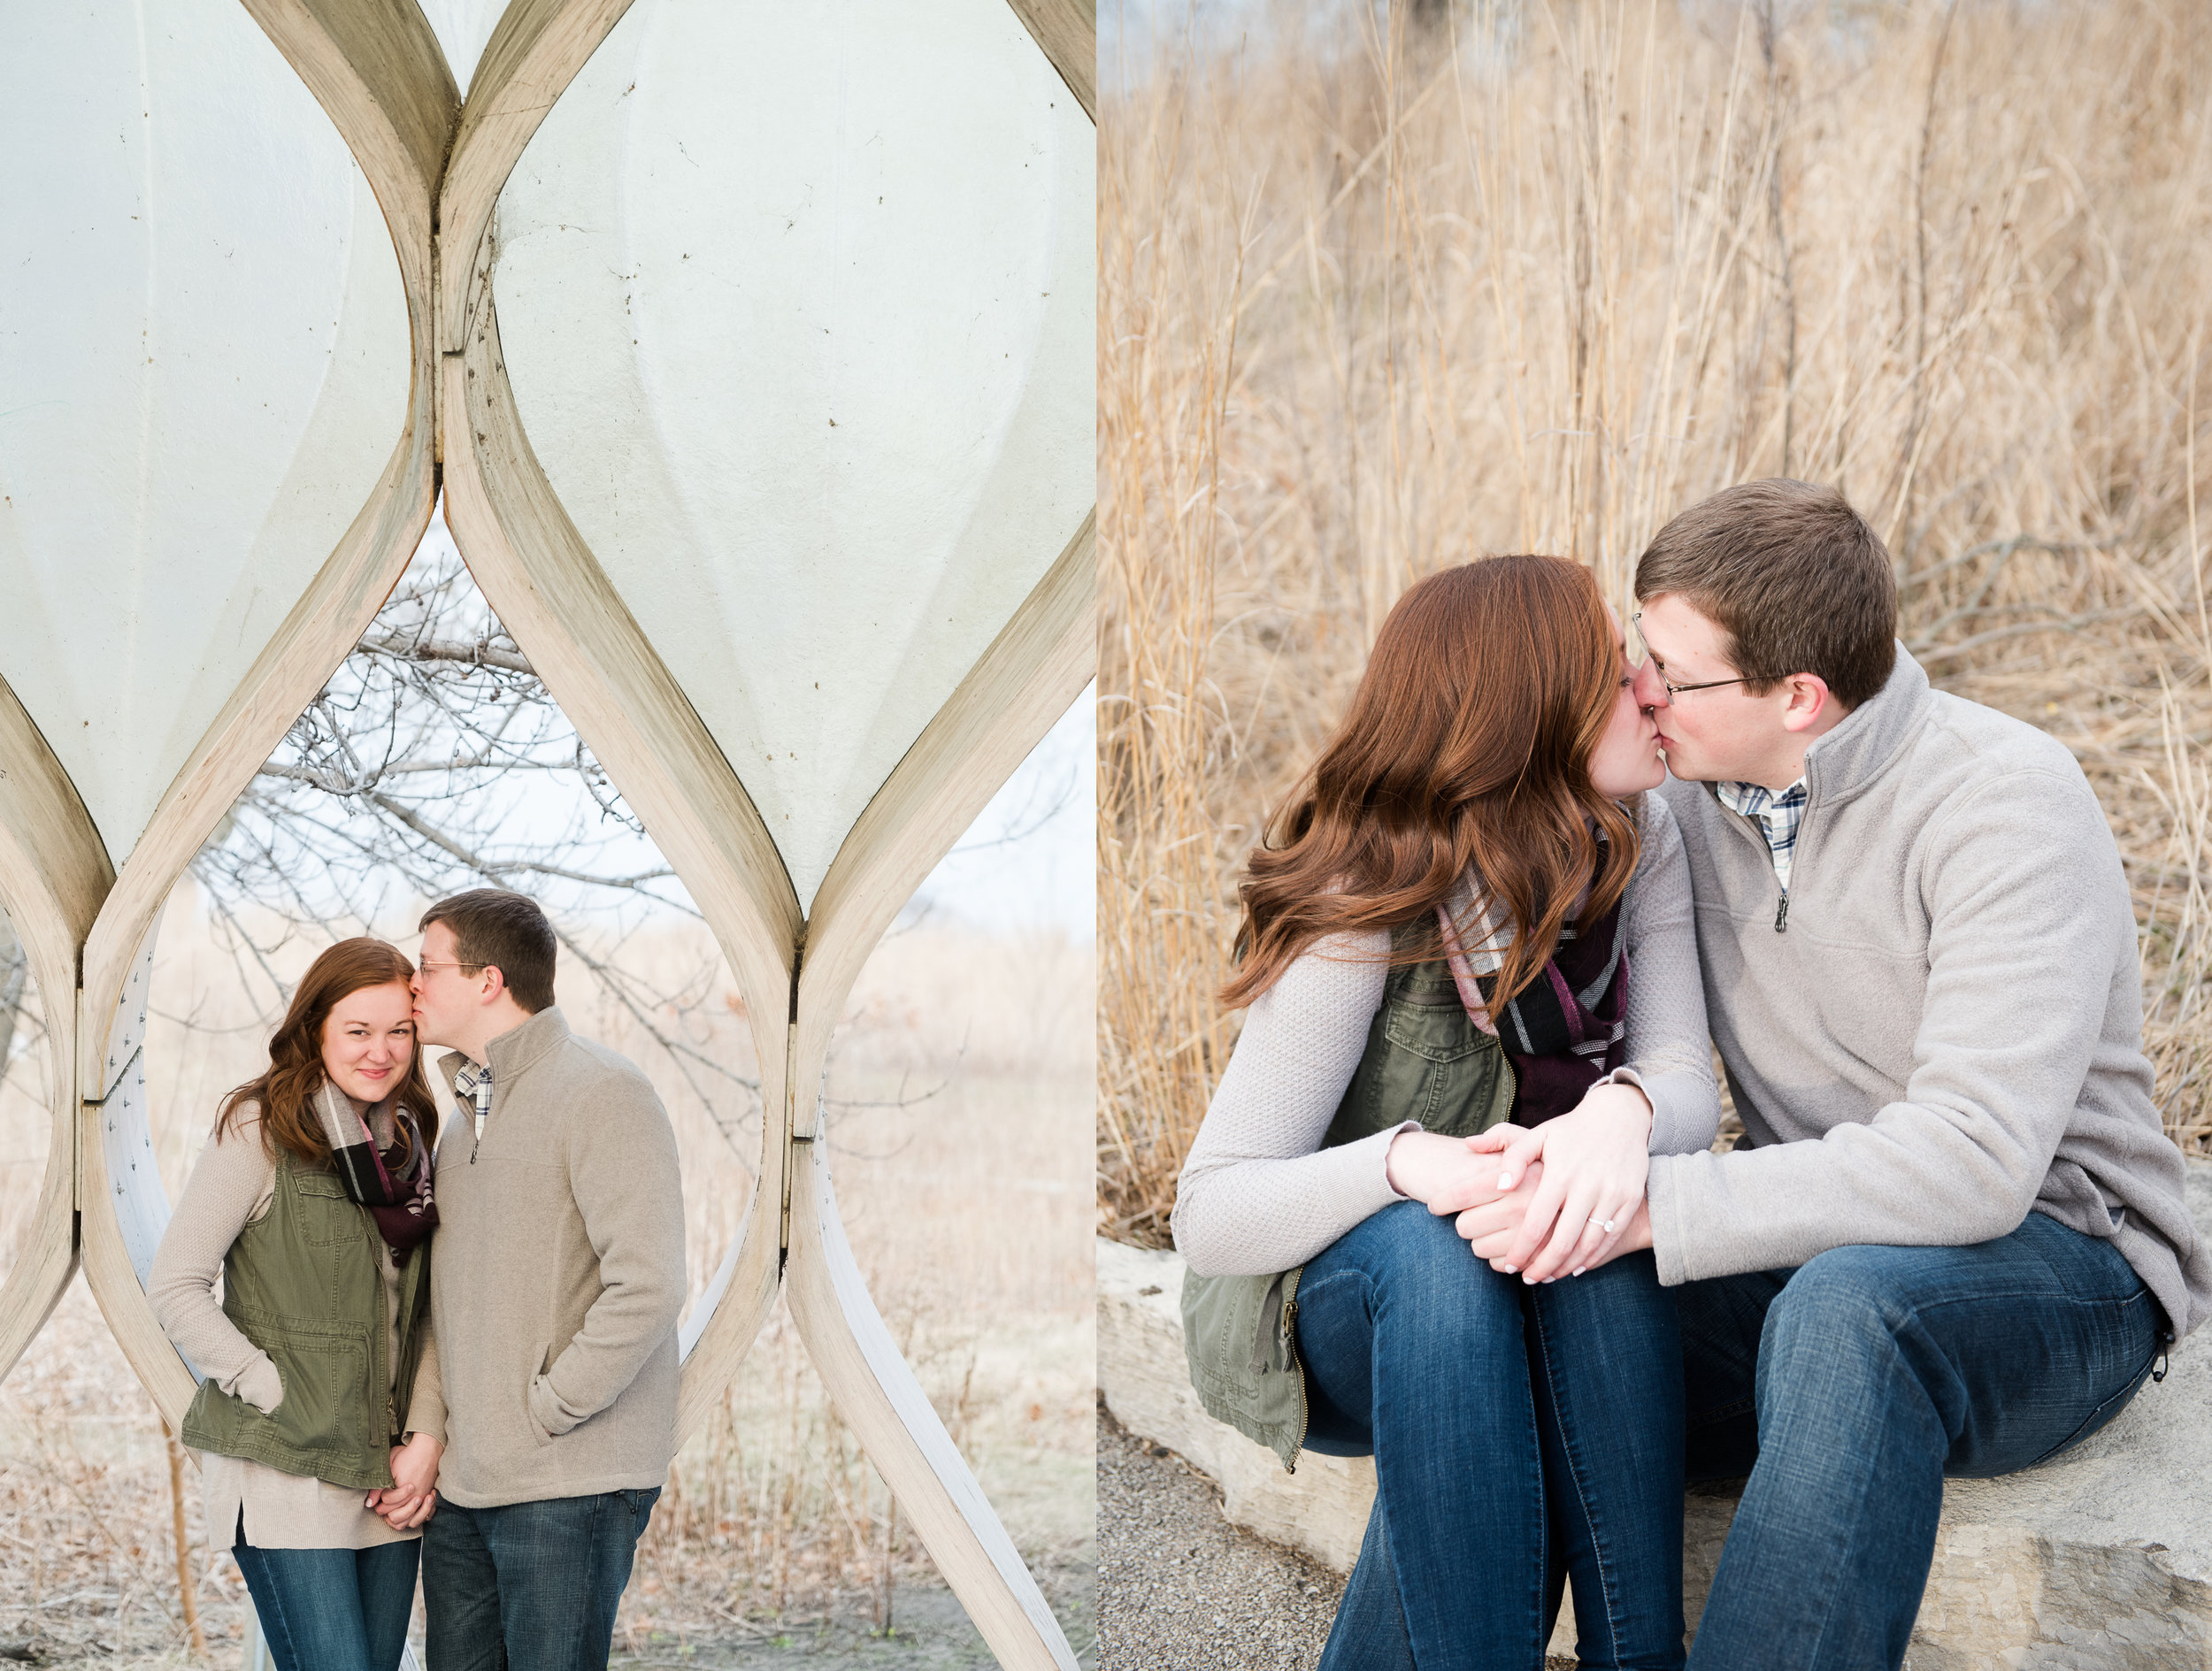 chicago-engagement-photography-metts-photo-14.jpg